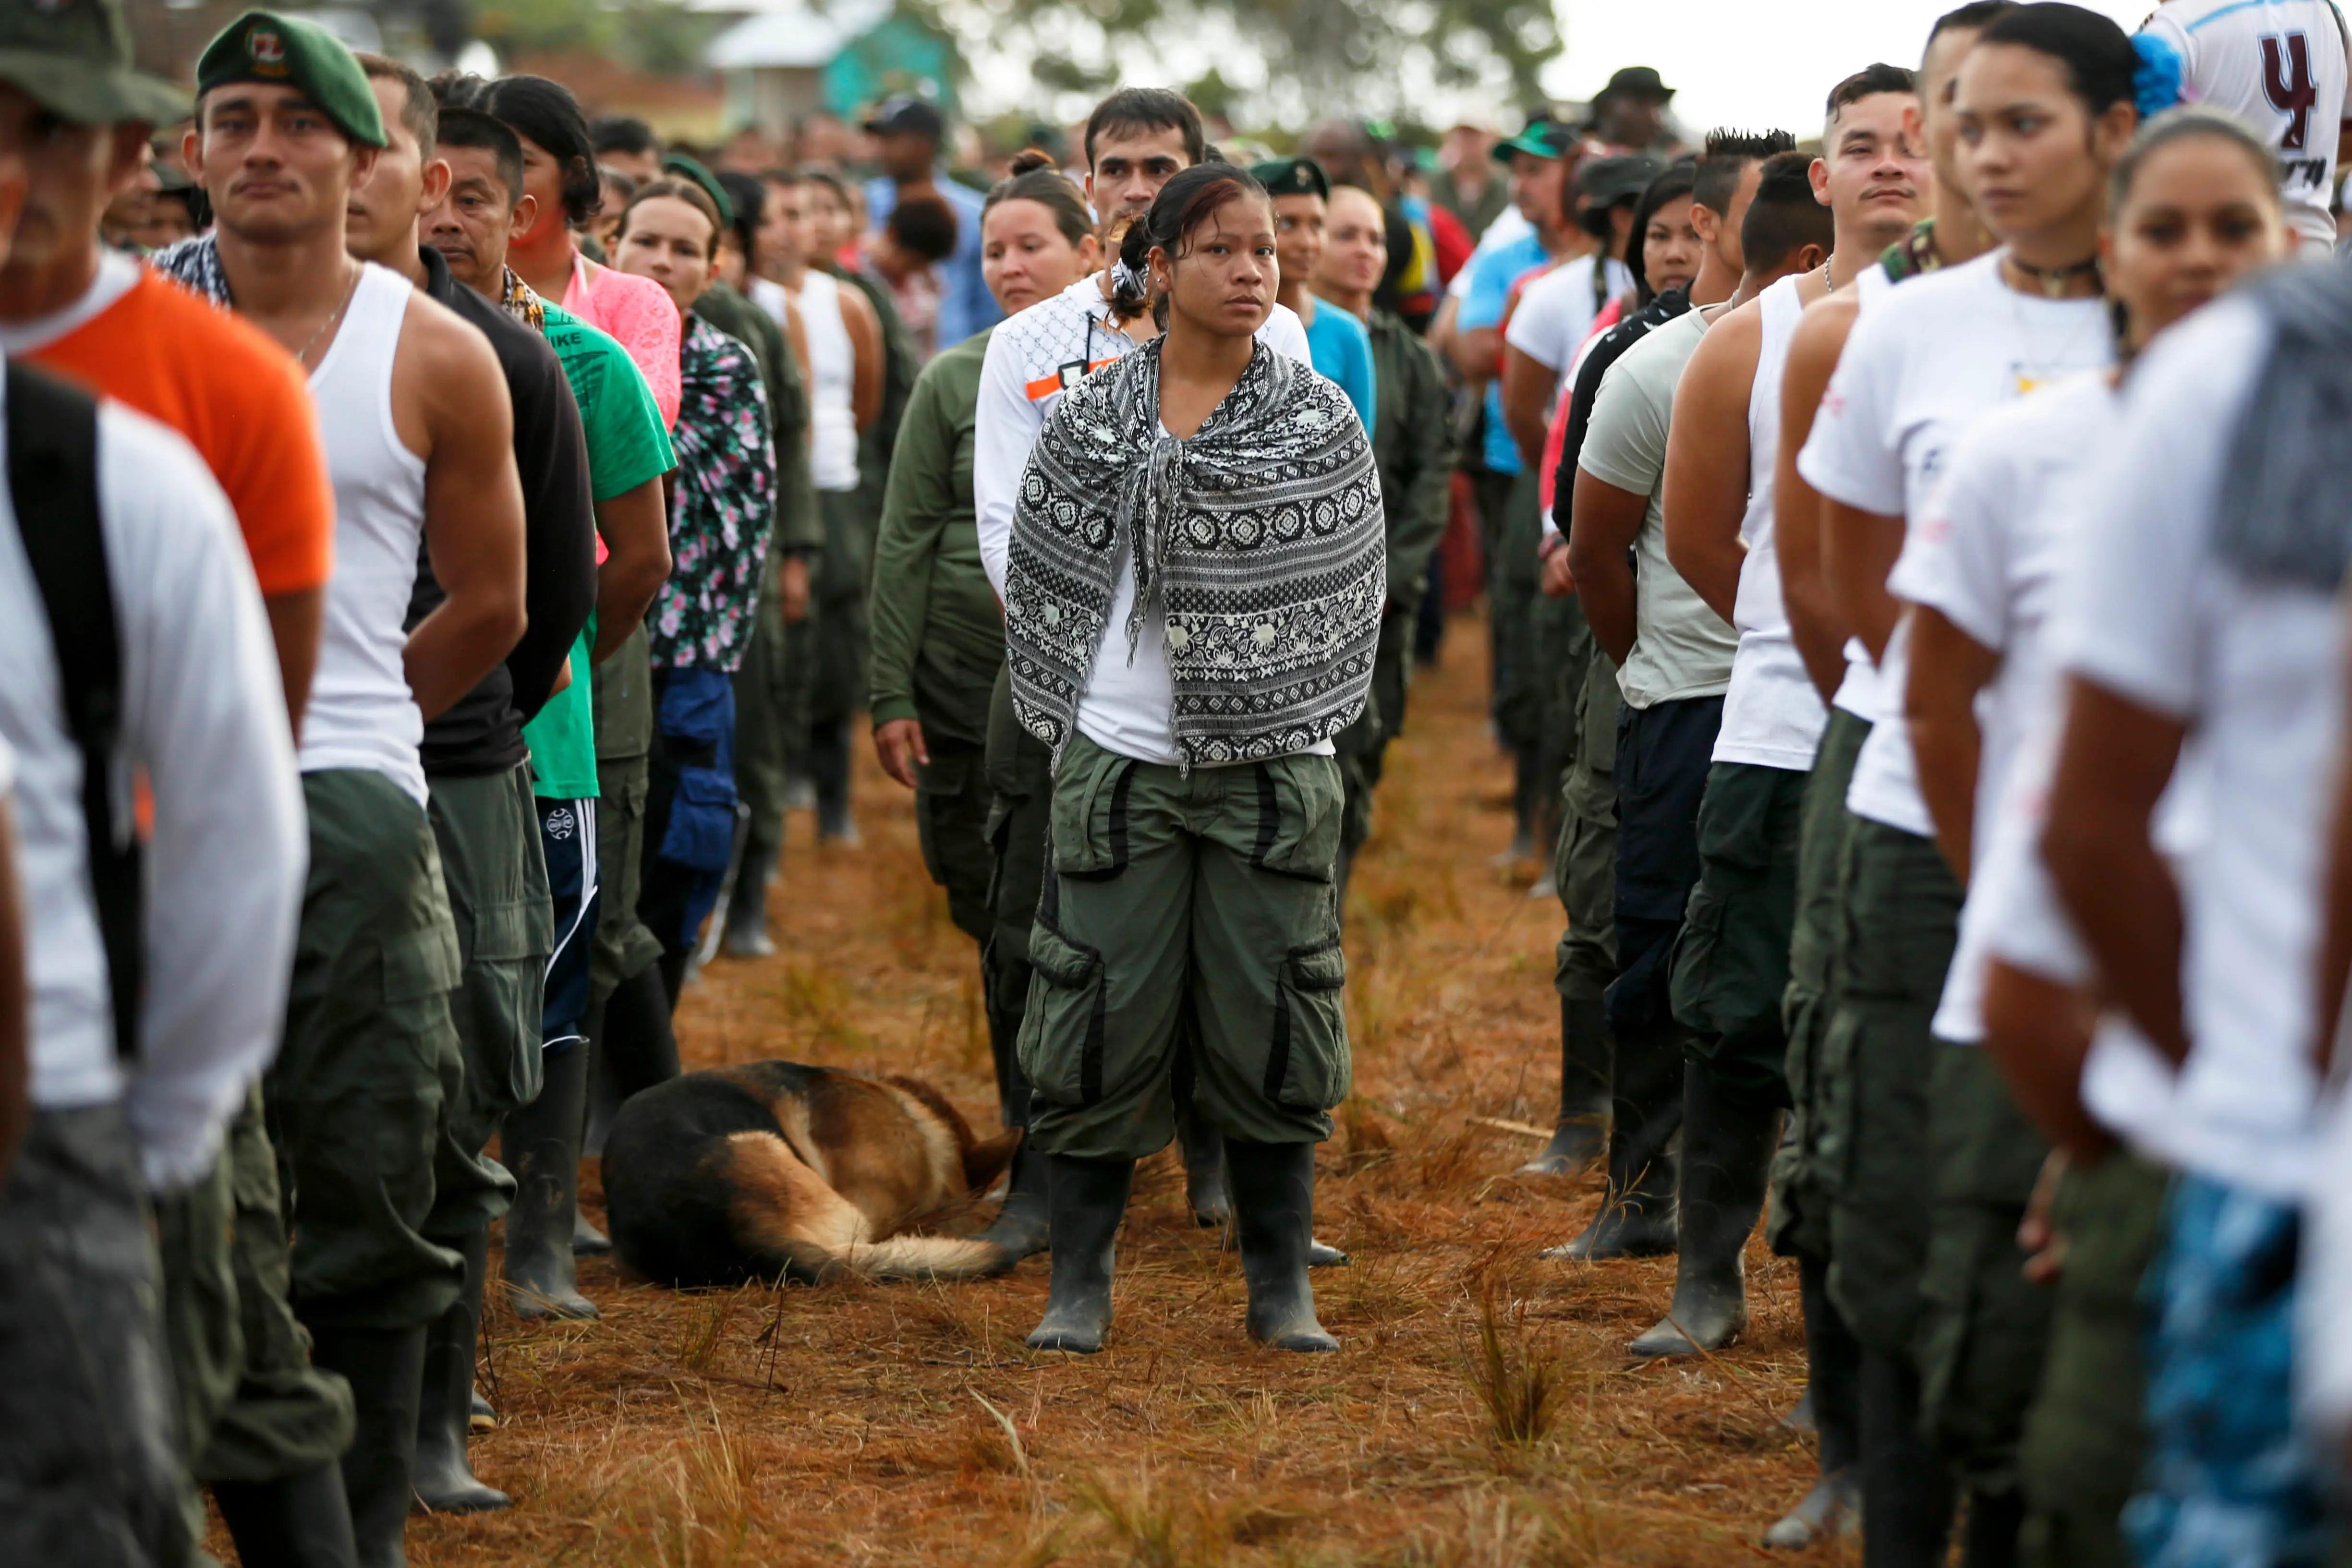 FARC rebels Colombia peace plan demobilization